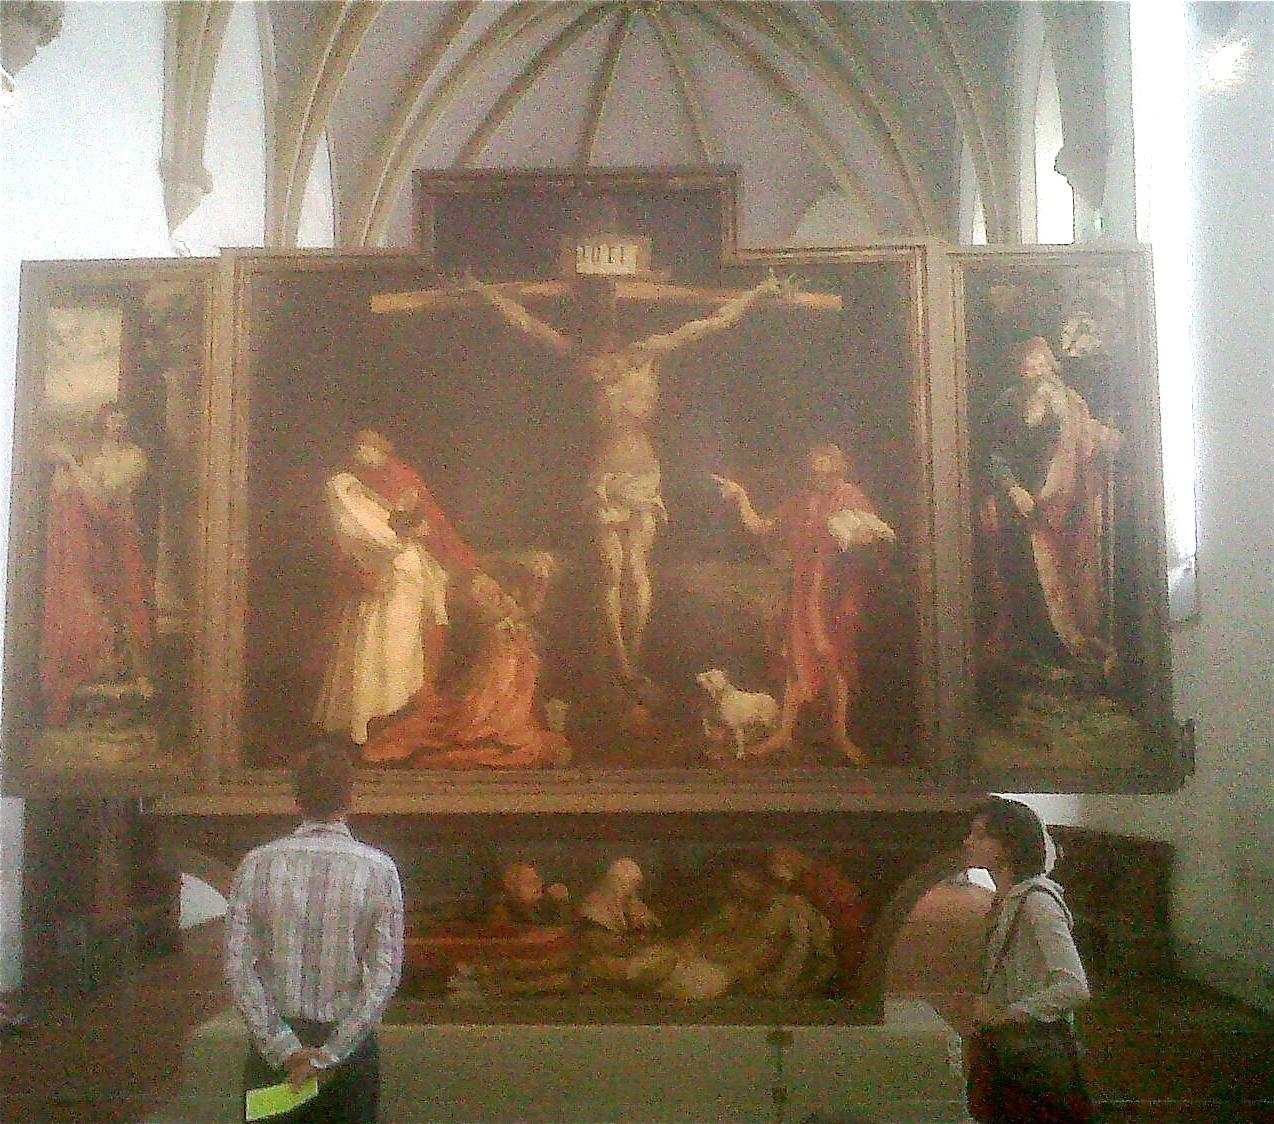 Regan O'Callaghan altar, Gruenwald, Jesus, Colmar